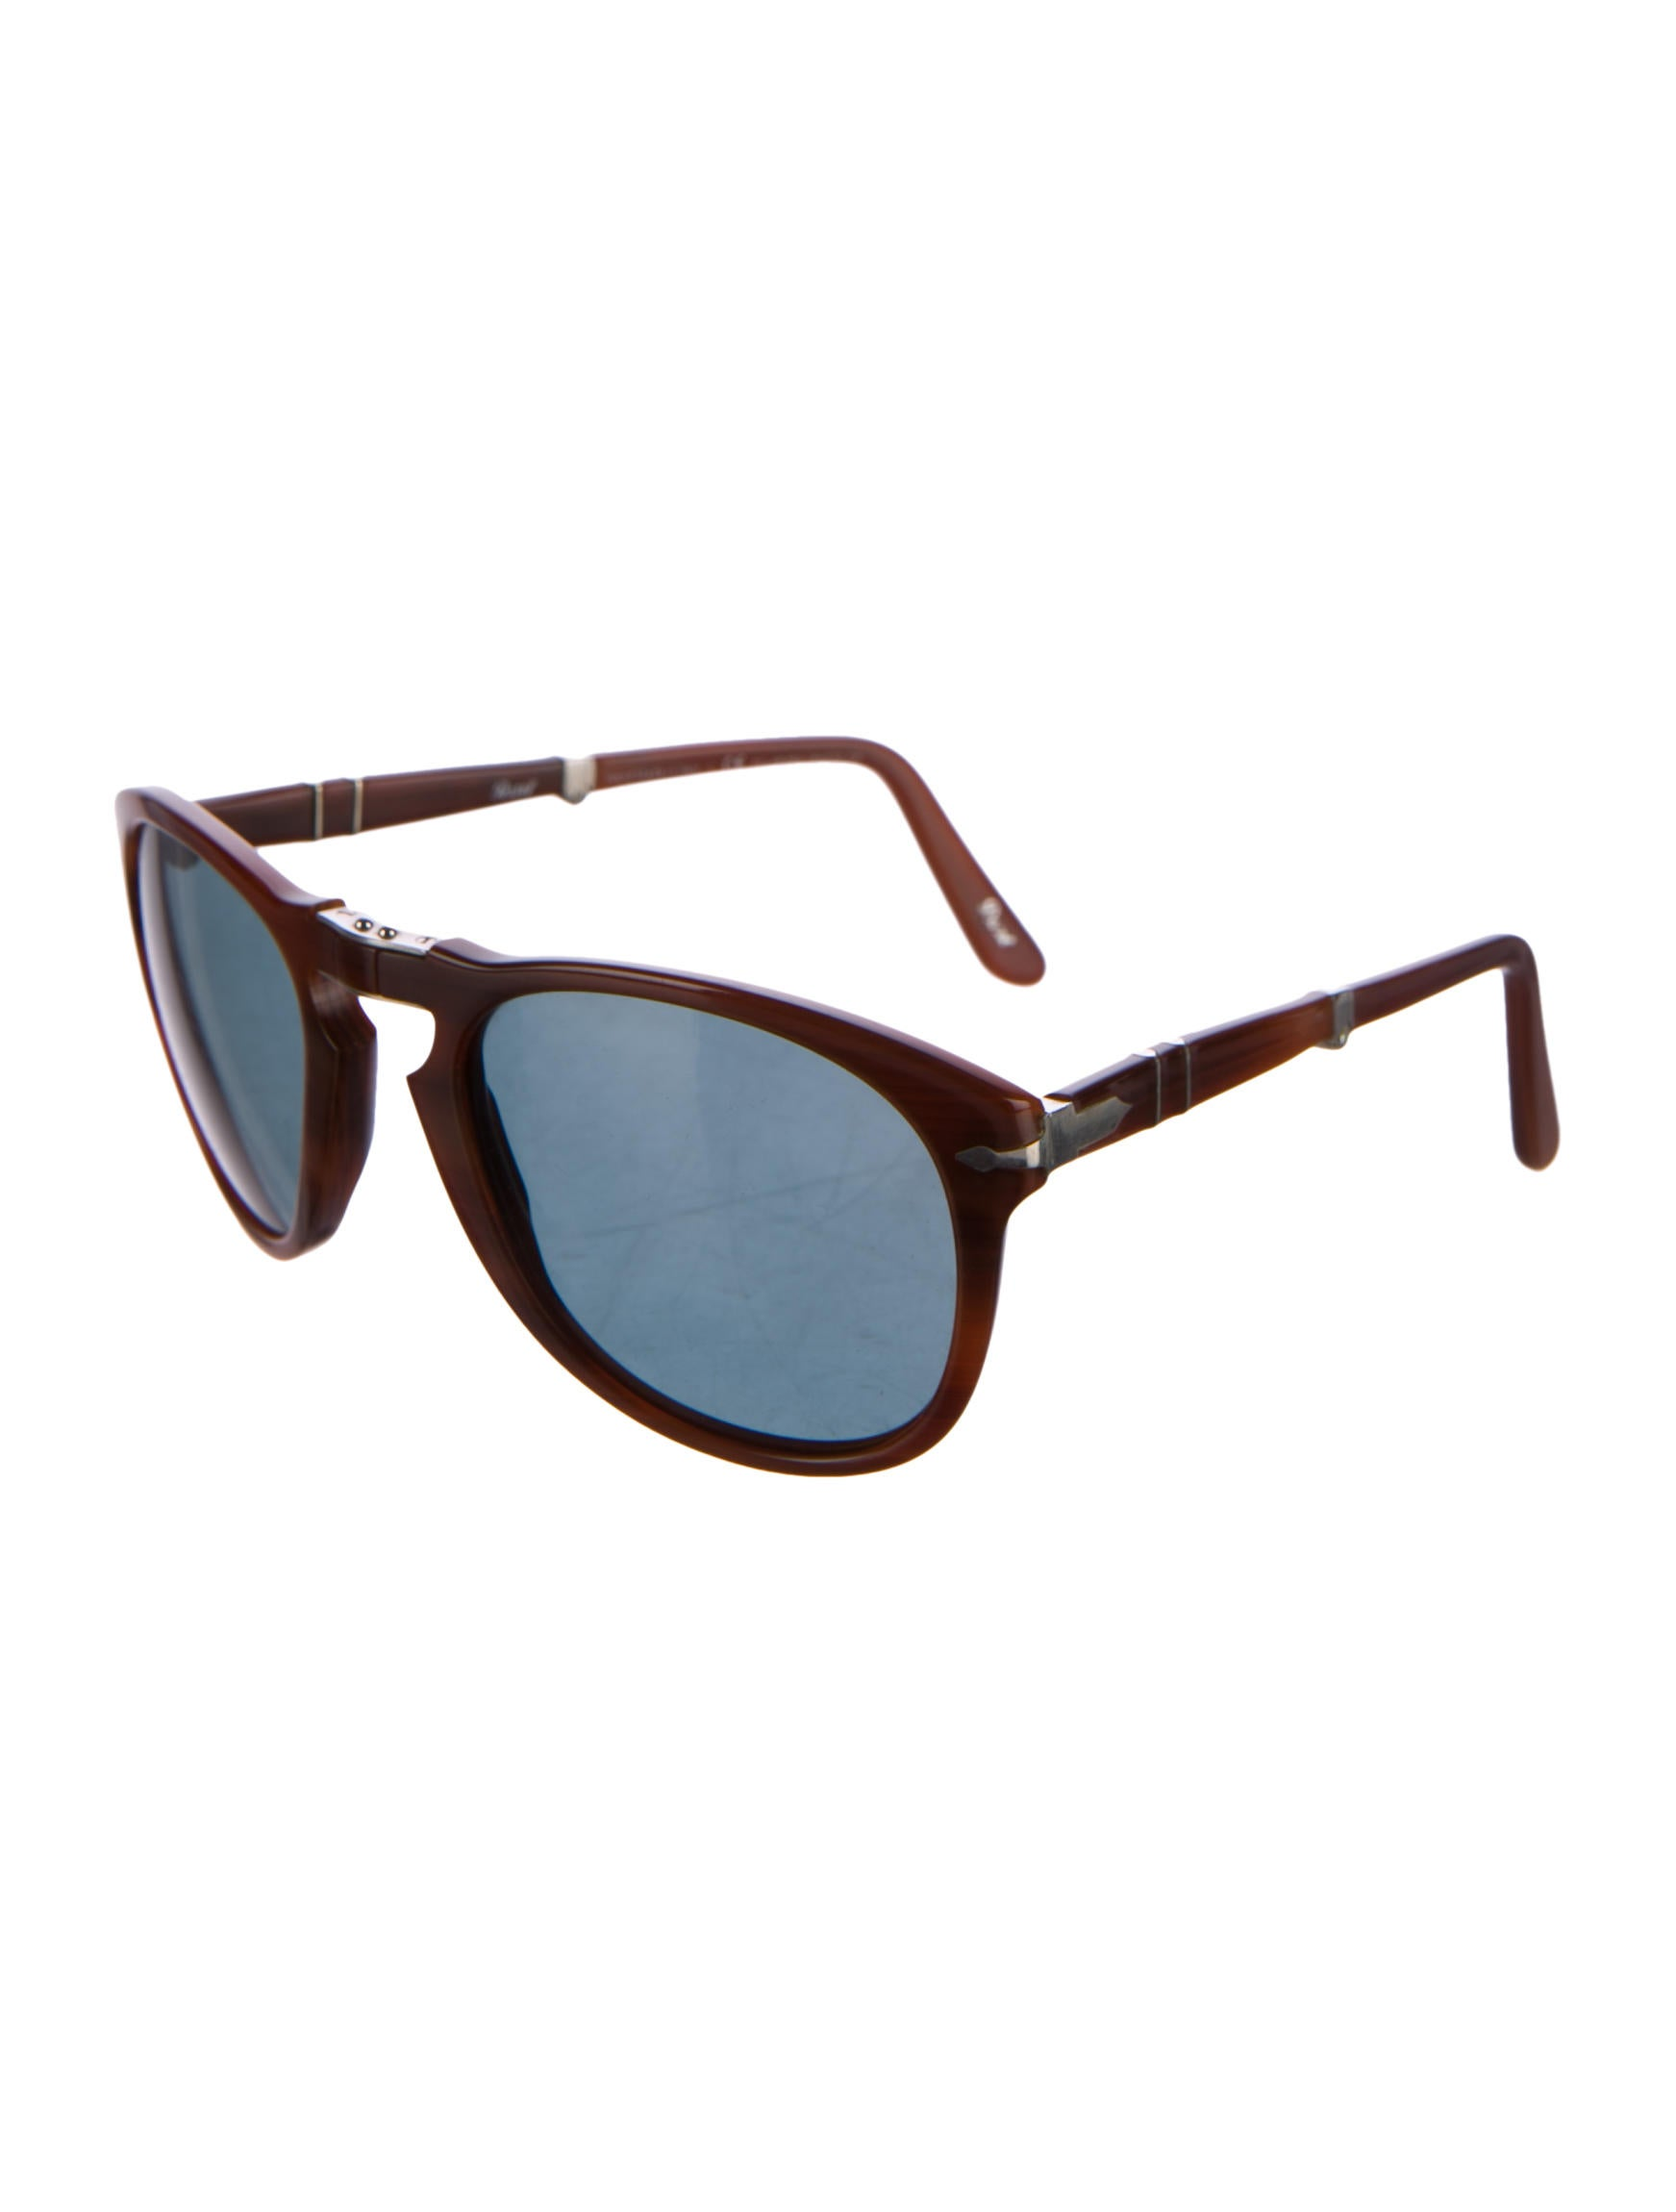 Persol Folding Acetate Frame Sunglasses